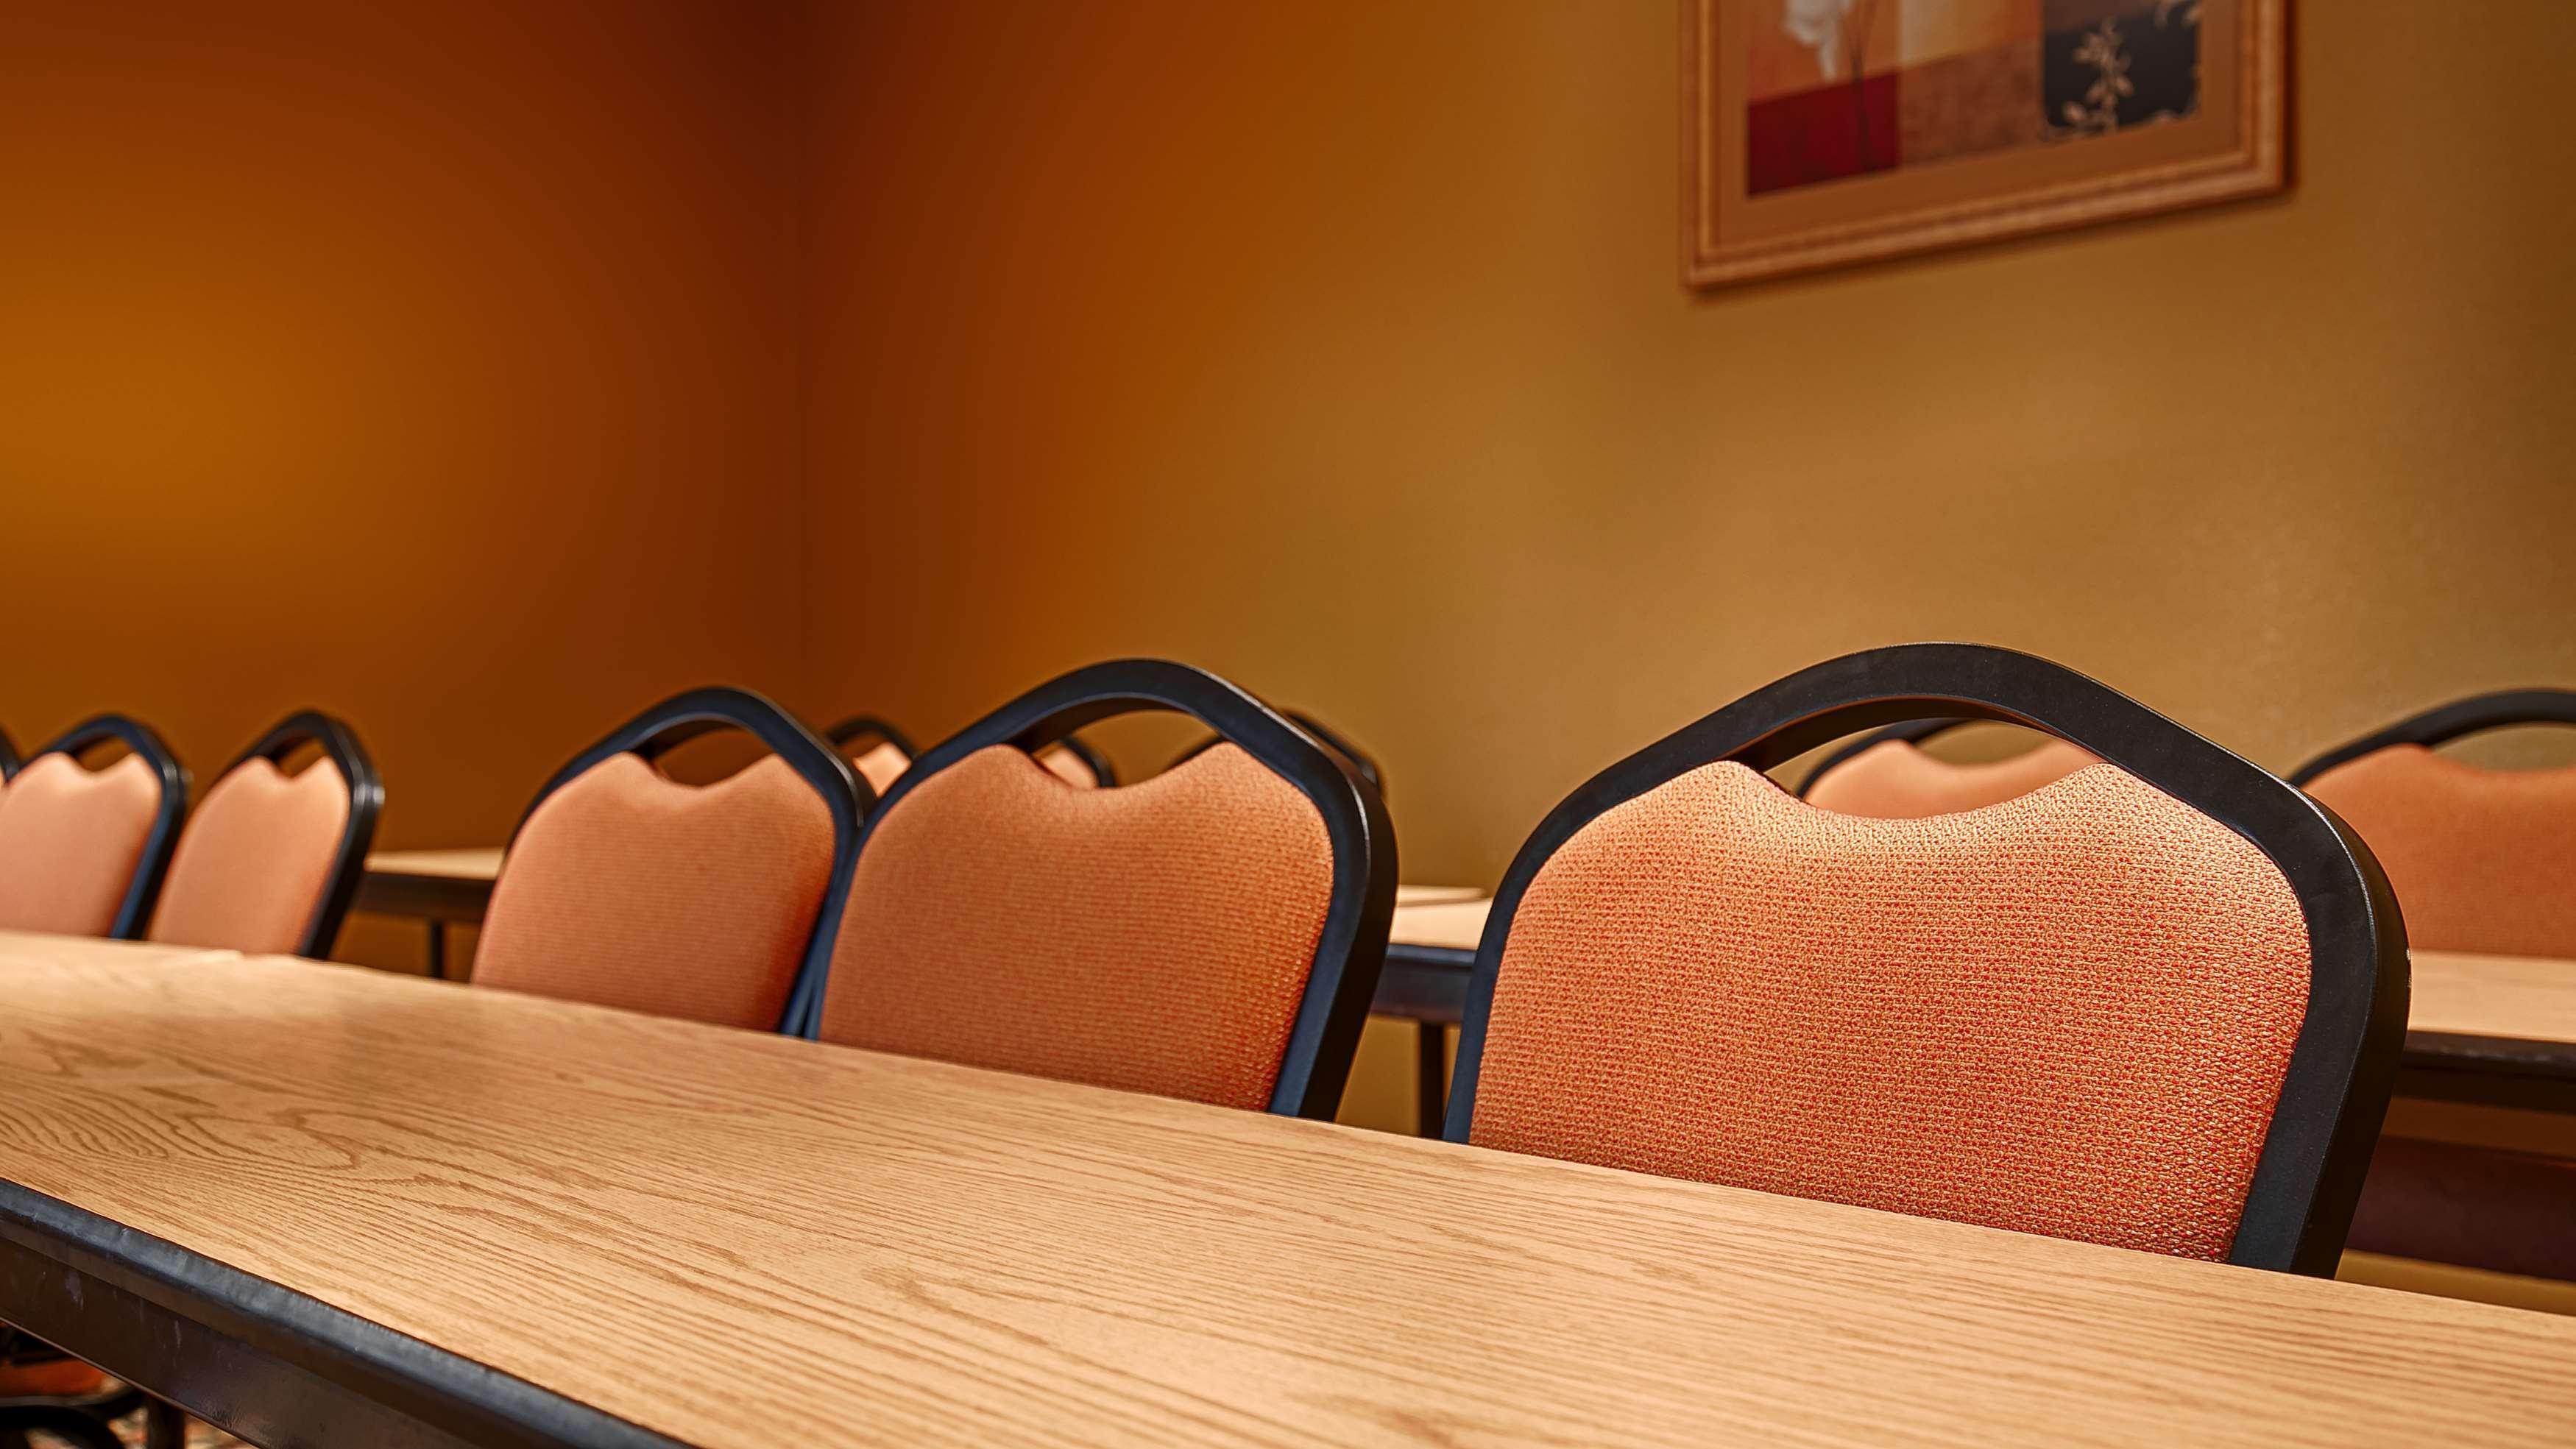 choice falls news comfort az green valley releases comforter sioux worldwide in sd inn international hotels suites opens